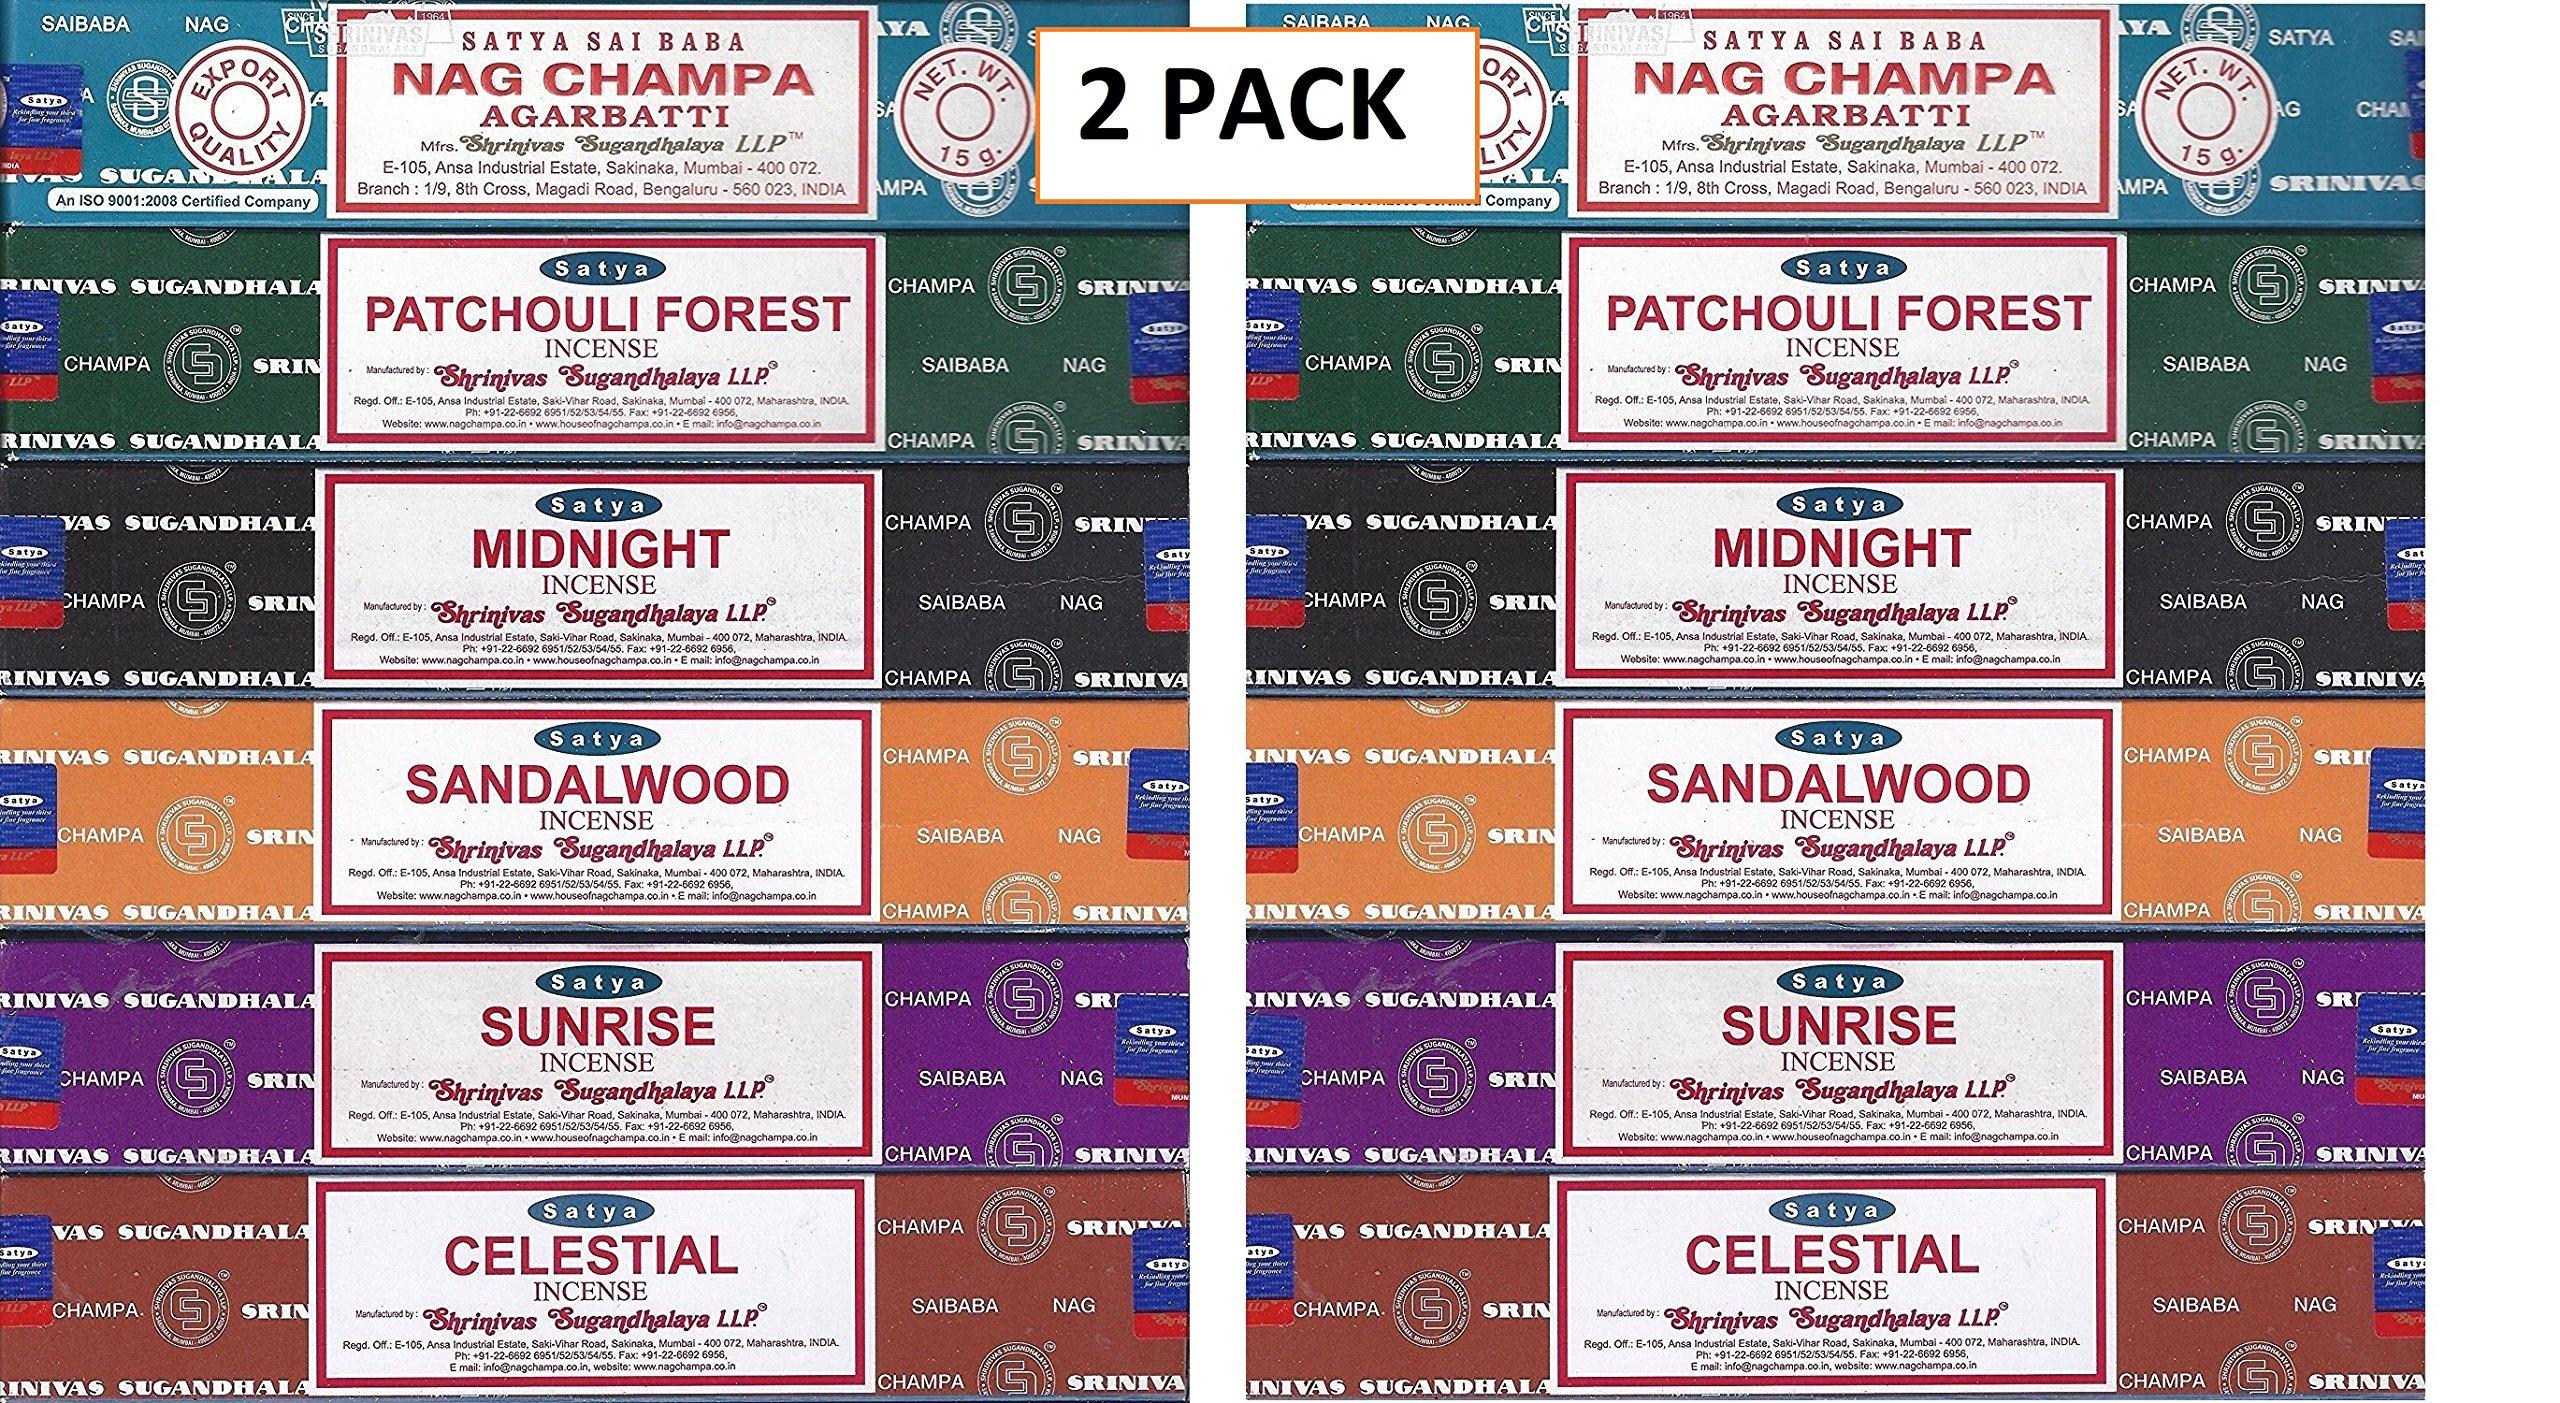 Satya - Set of 6 - Nag Champa, Sunrise, Sandalwood, Midnight, Patchouli, Celestial 15 grams (2 Pack)